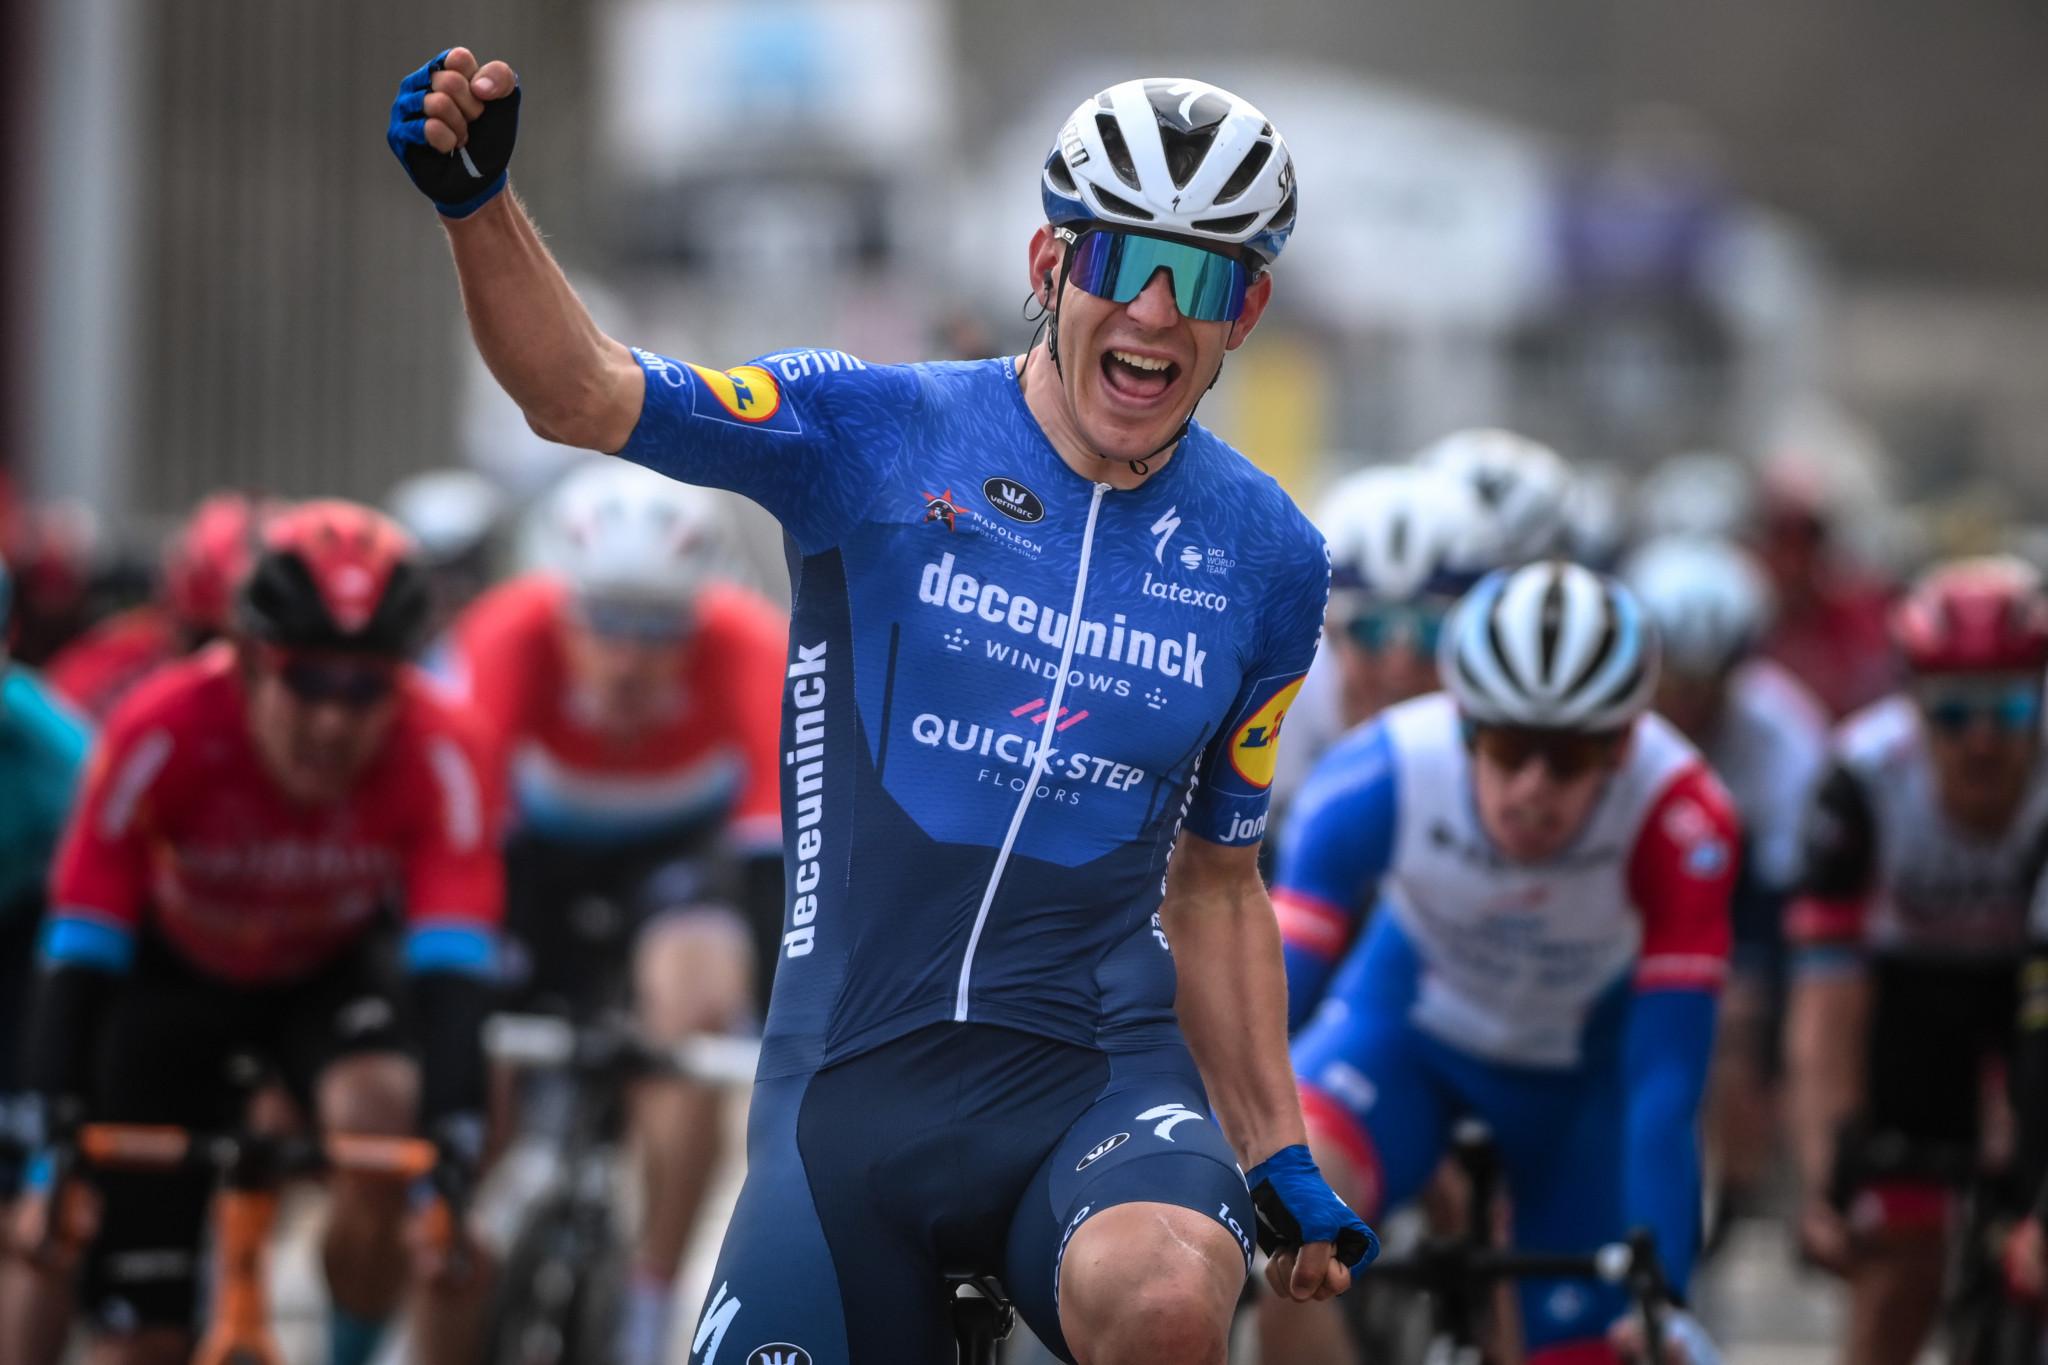 Italy's Davide Ballerini sprinted to victory at Omloop Het Nieuwsblad ©Getty Images